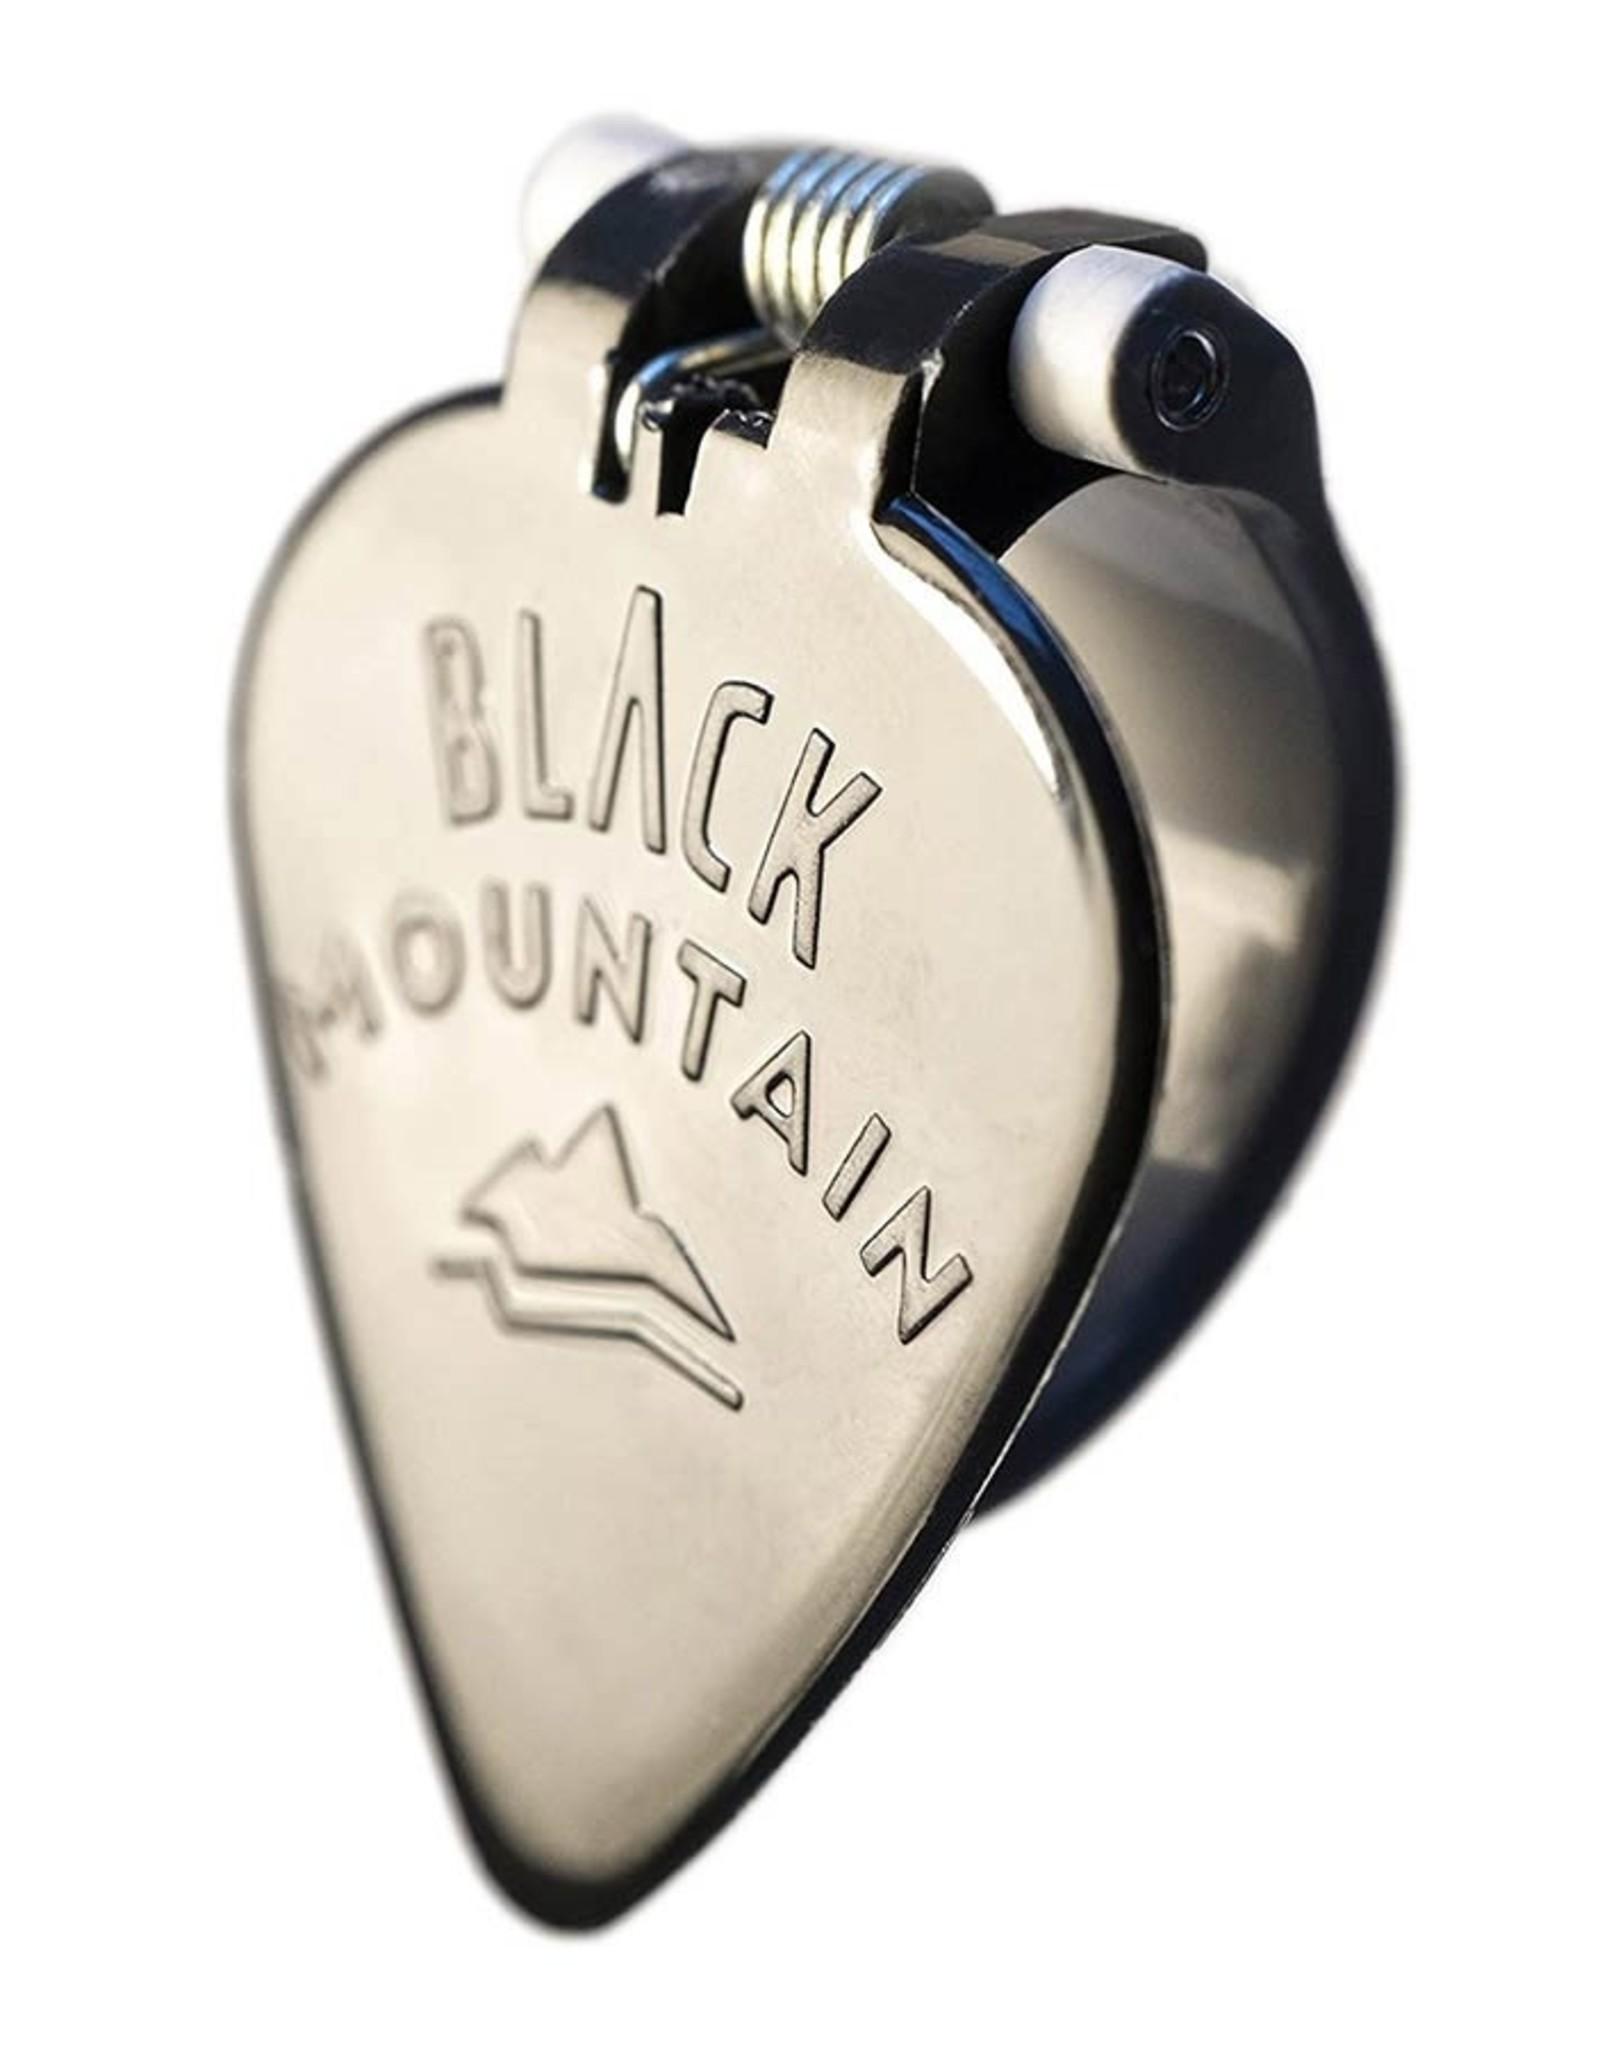 Specter Specter Black Mountain Professionele Duimplectrum